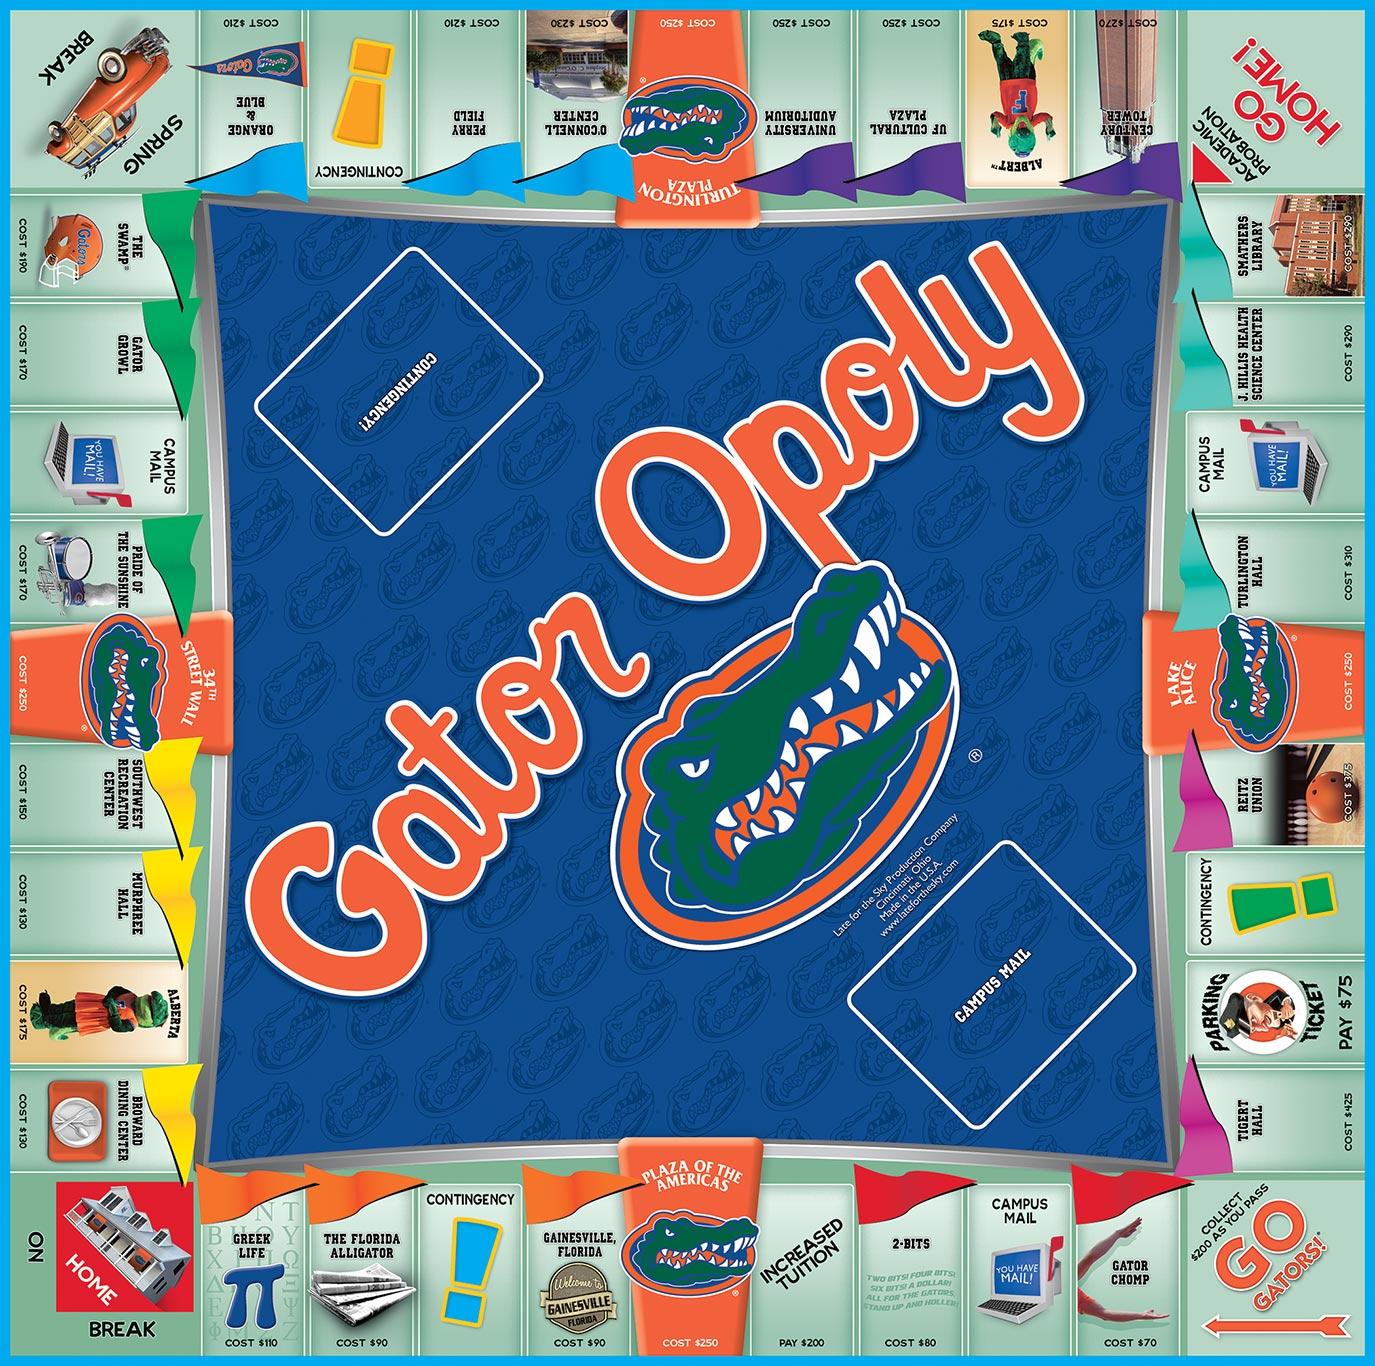 GATOROPOLY Board Game